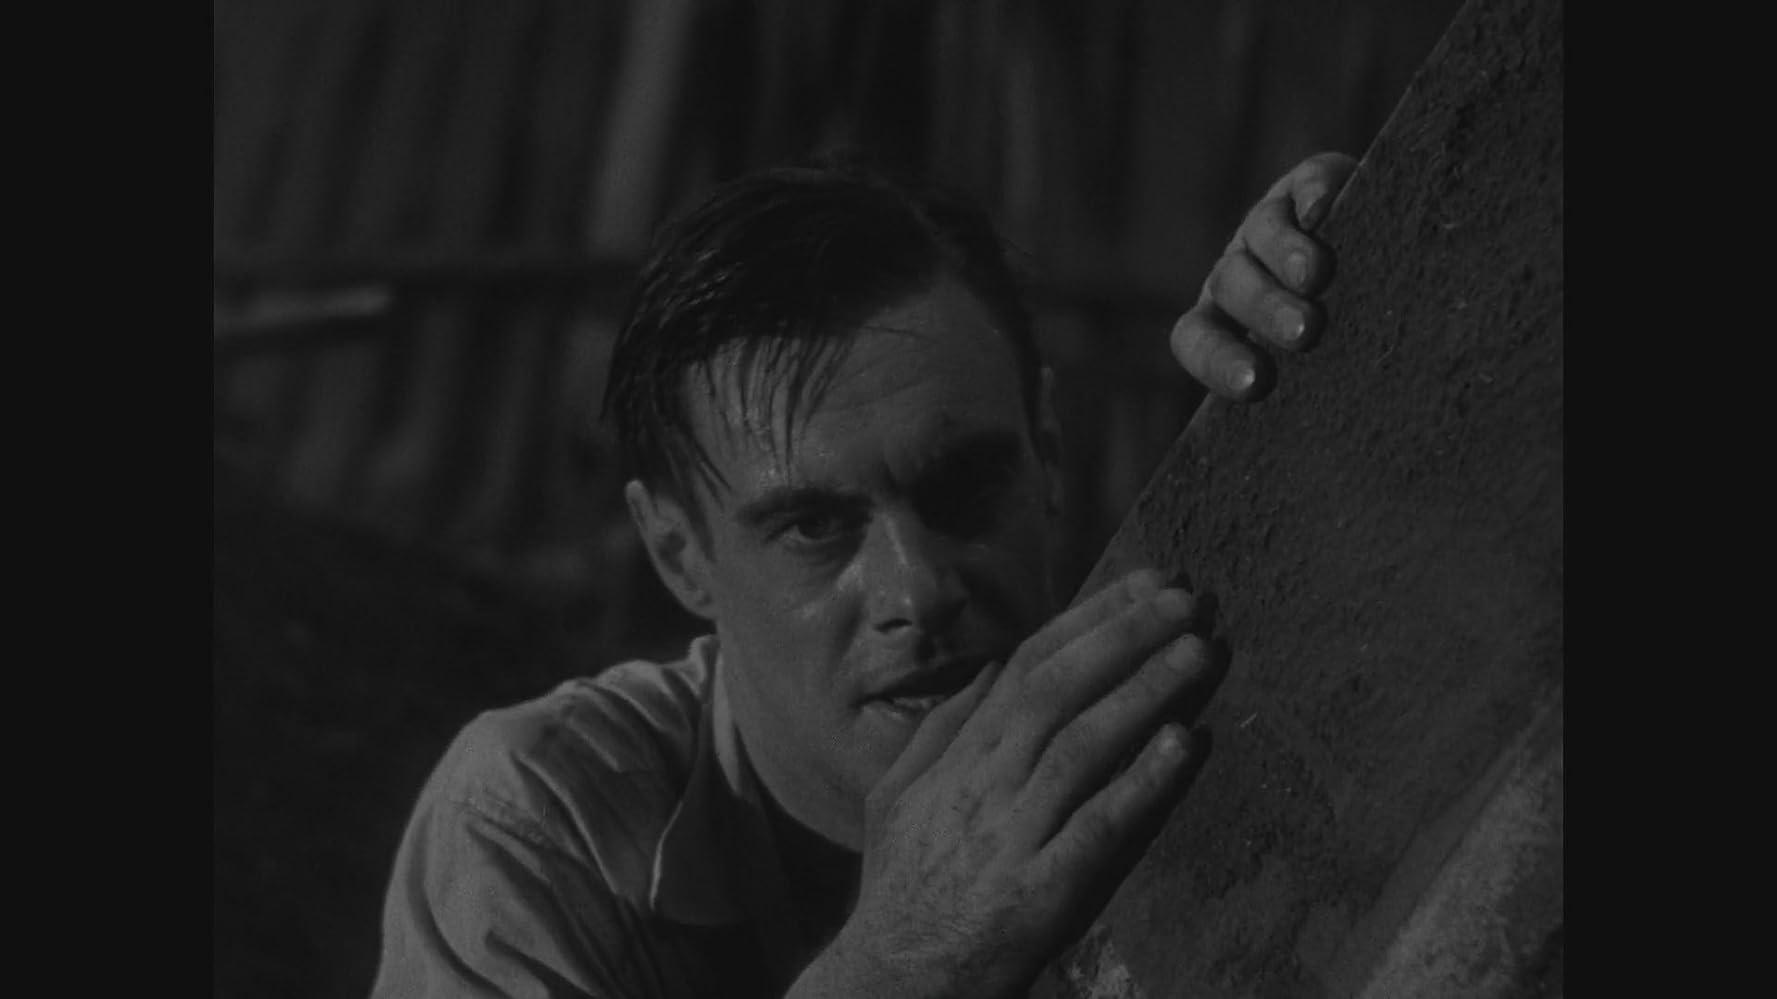 Colin Clive in Bride of Frankenstein (1935)